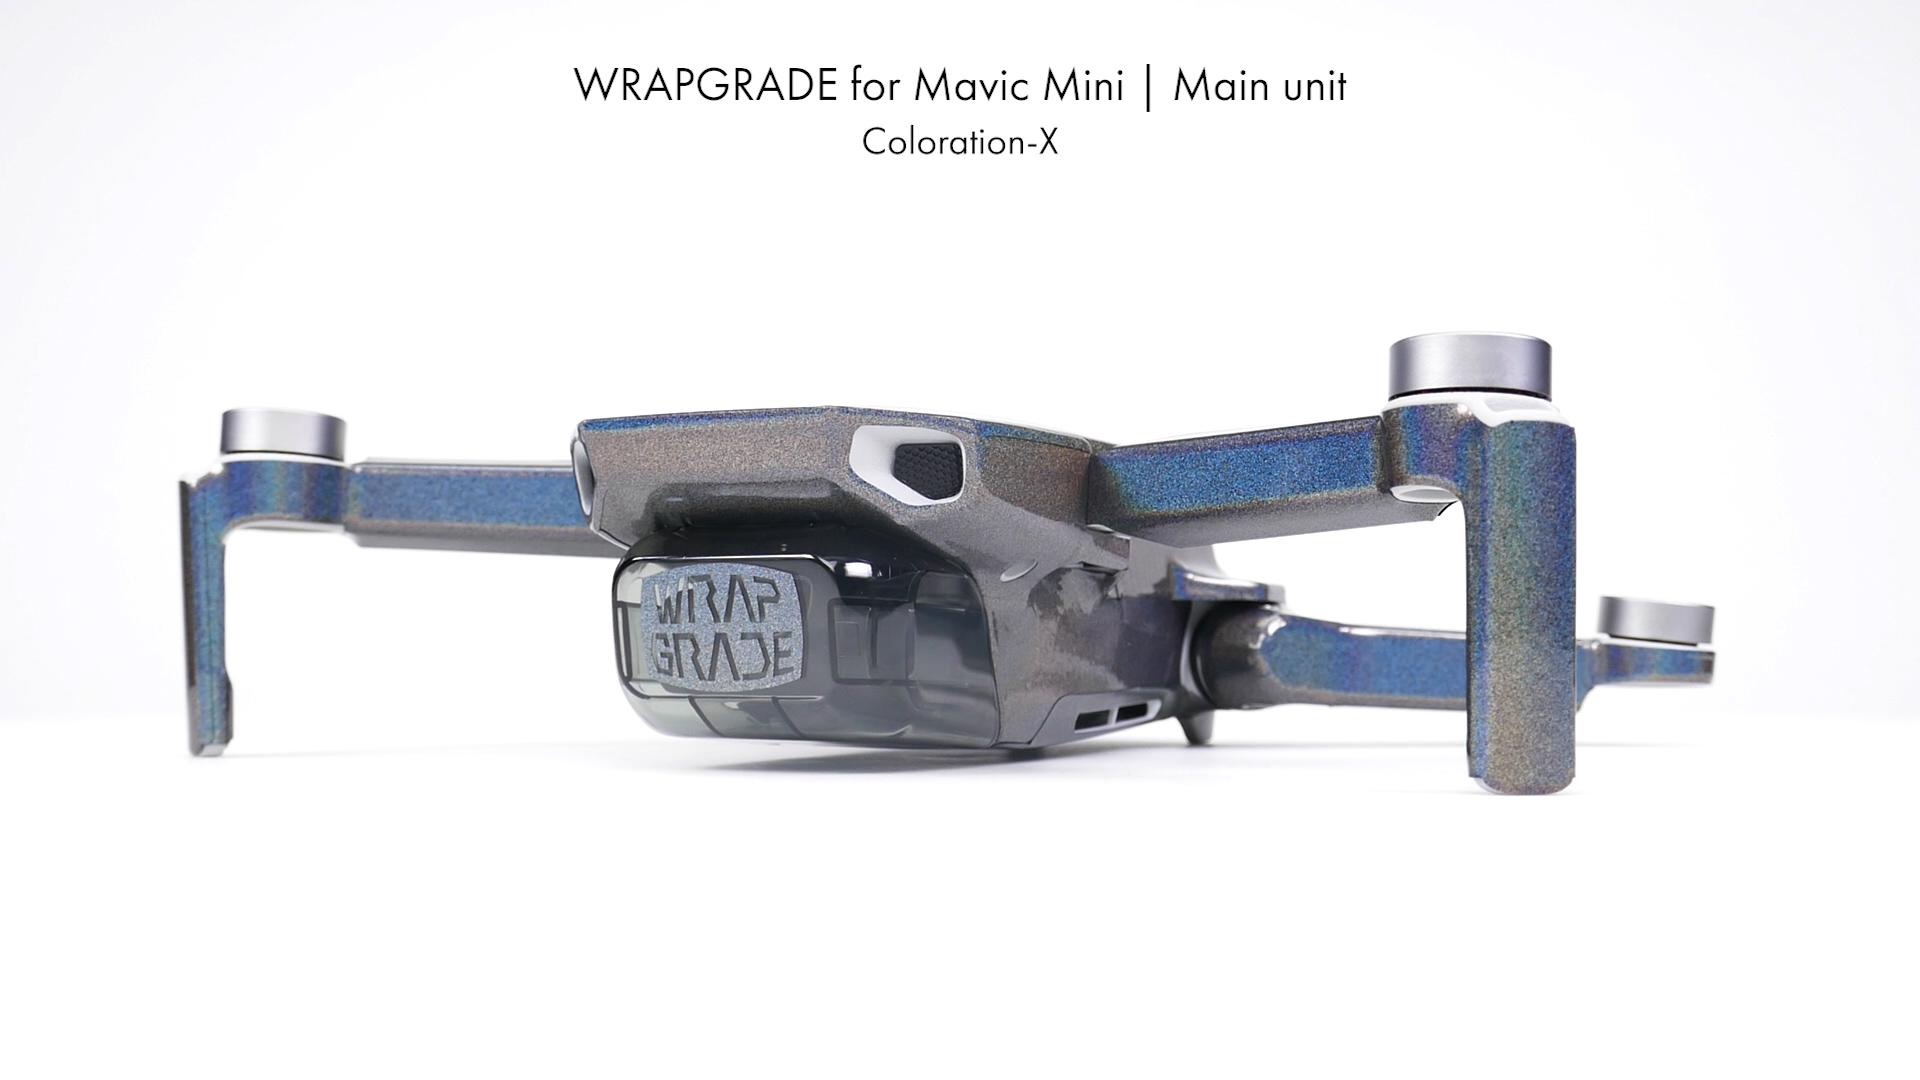 Coloration-X Wrapgrade Skin Compatible with DJI Mavic Mini